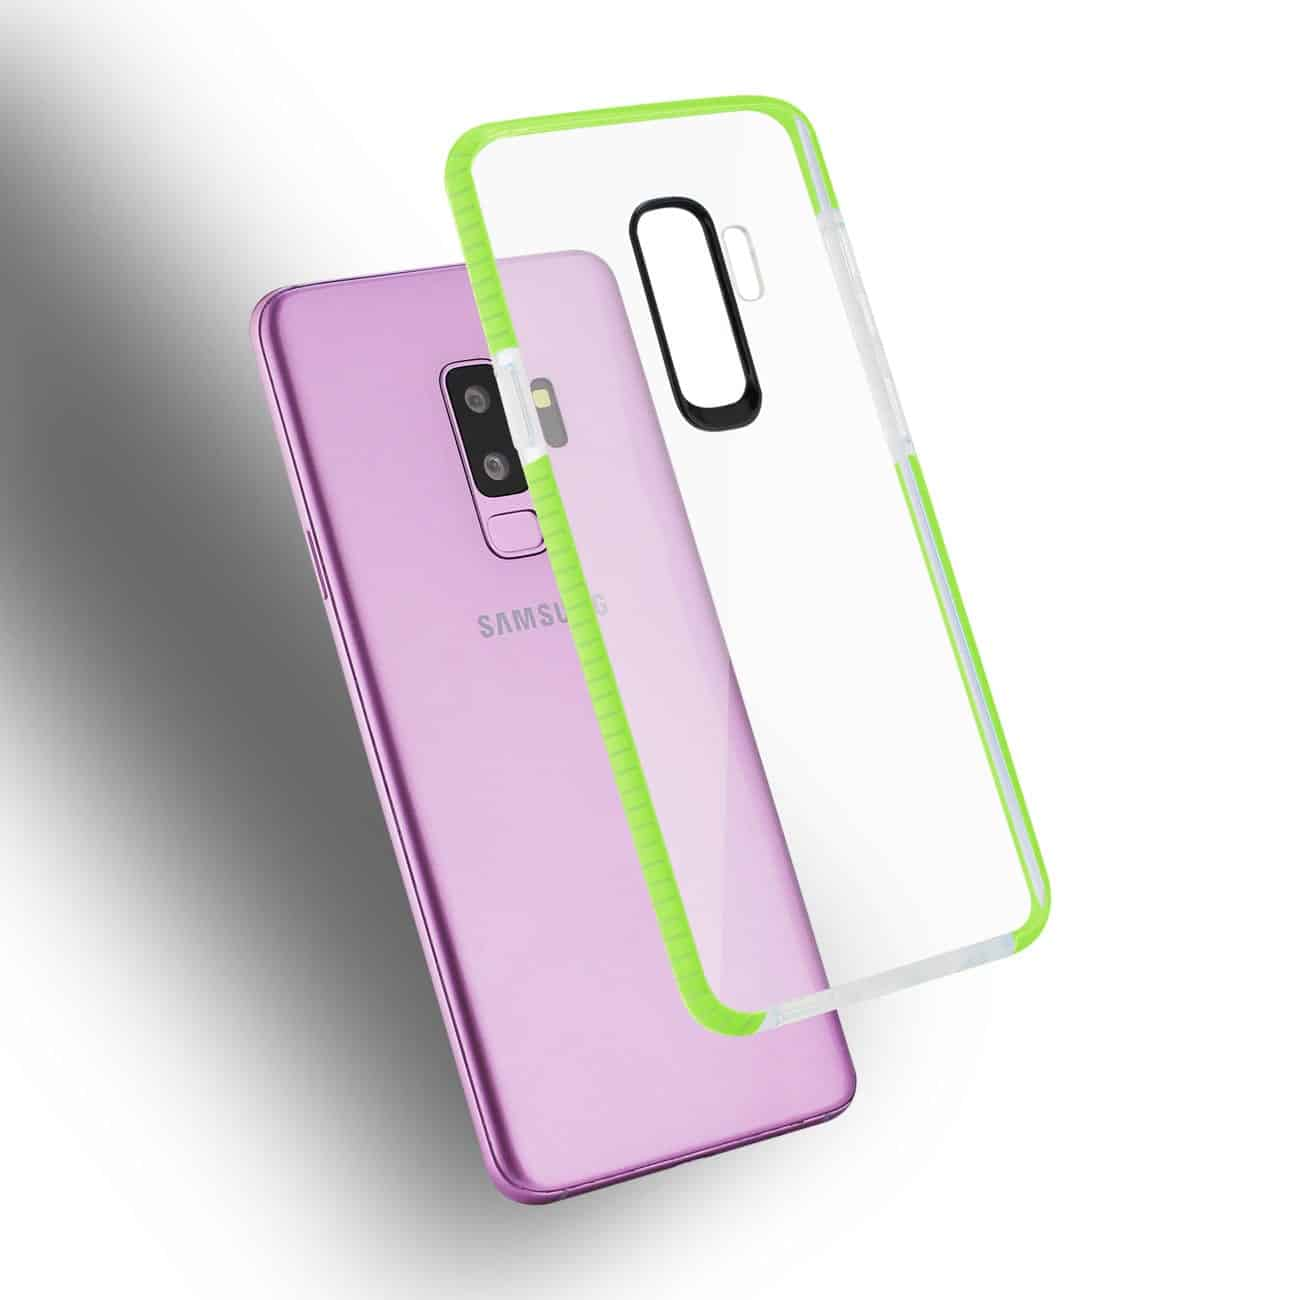 Samsung Galaxy S9 Plus Soft Transparent TPU Case In Clear Green